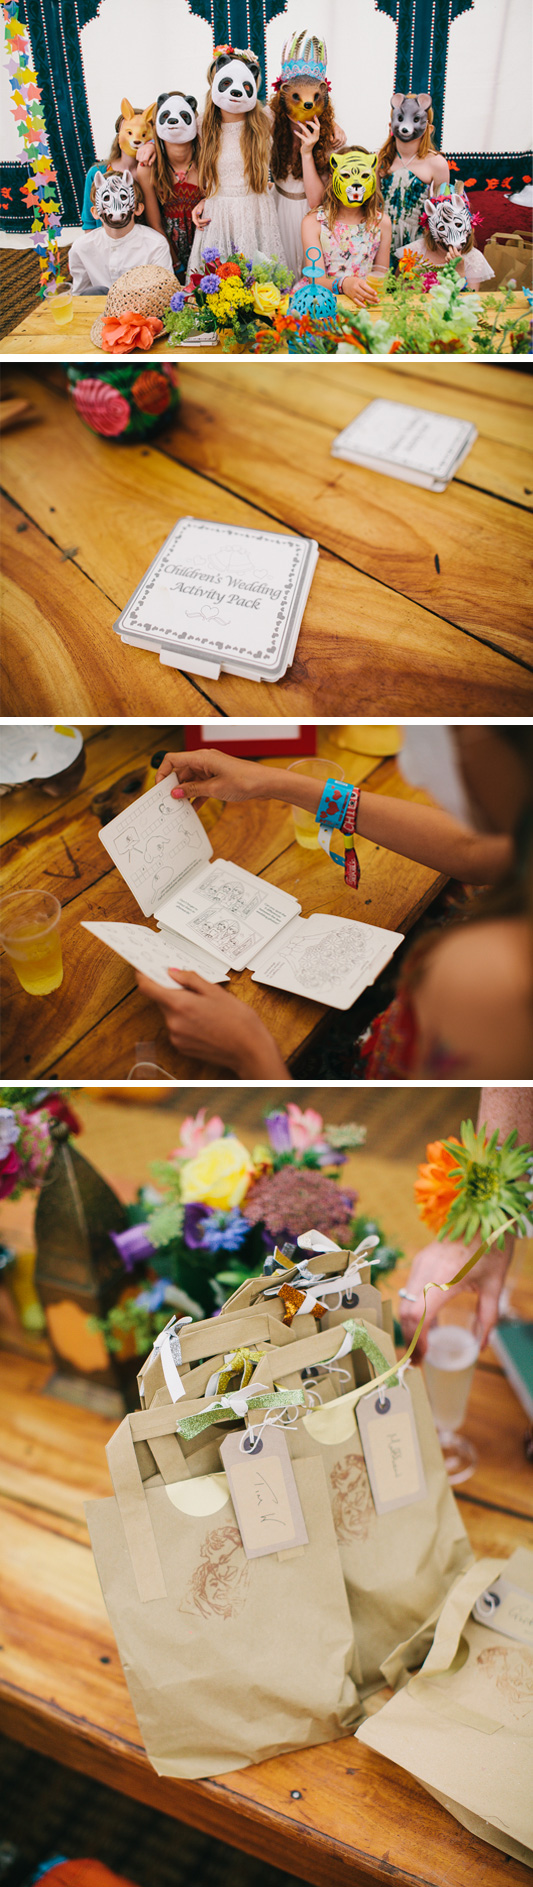 detalles bodas niños